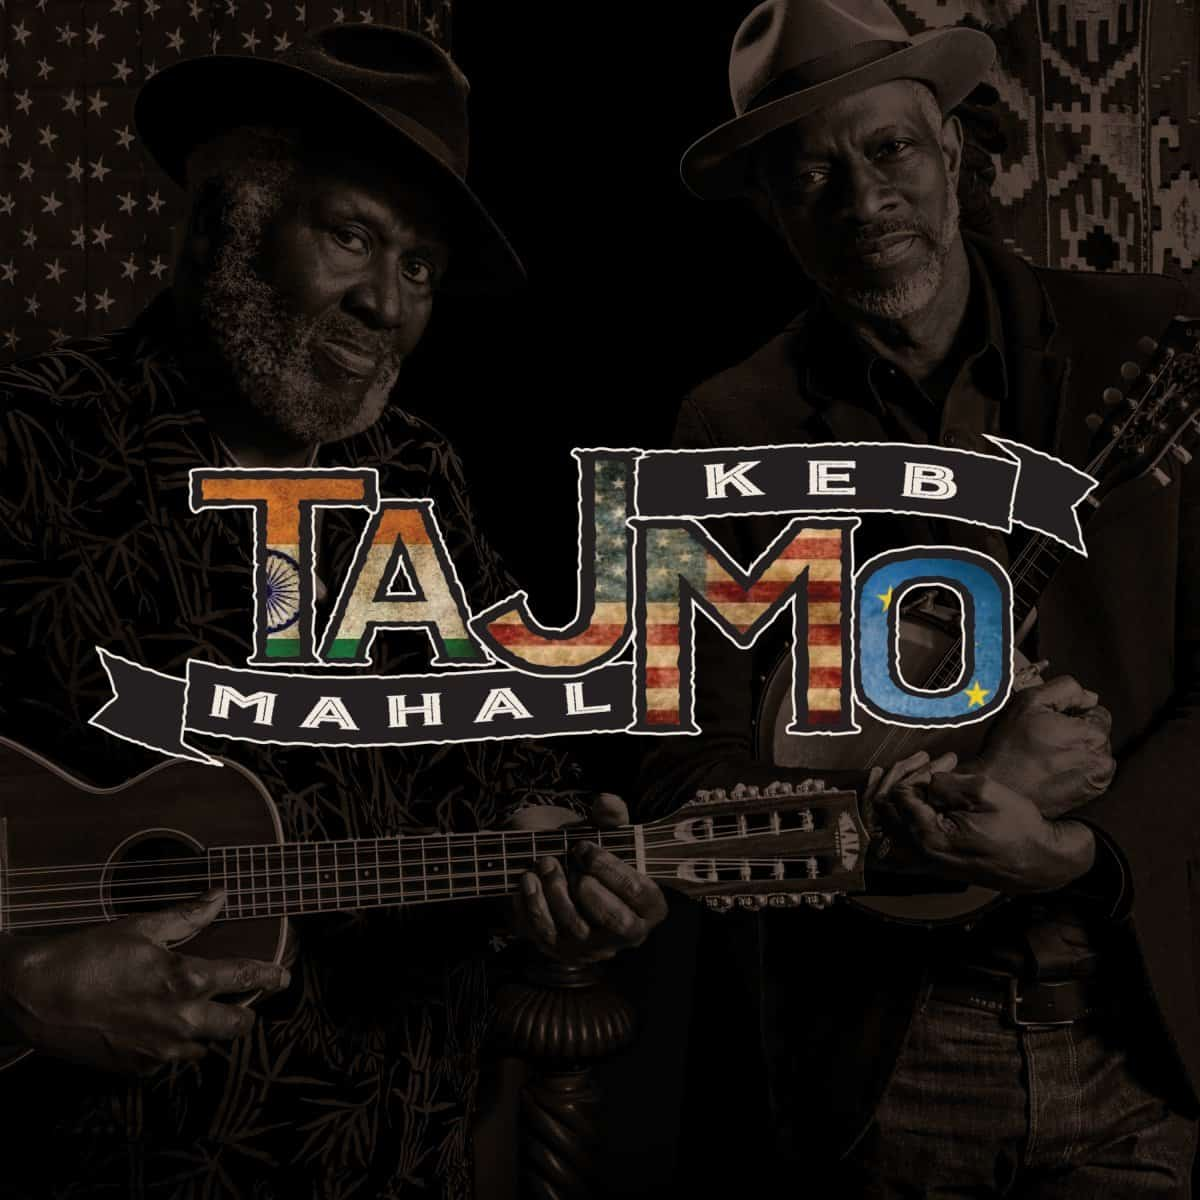 Taj Mahal and Keb Mo Tajmo